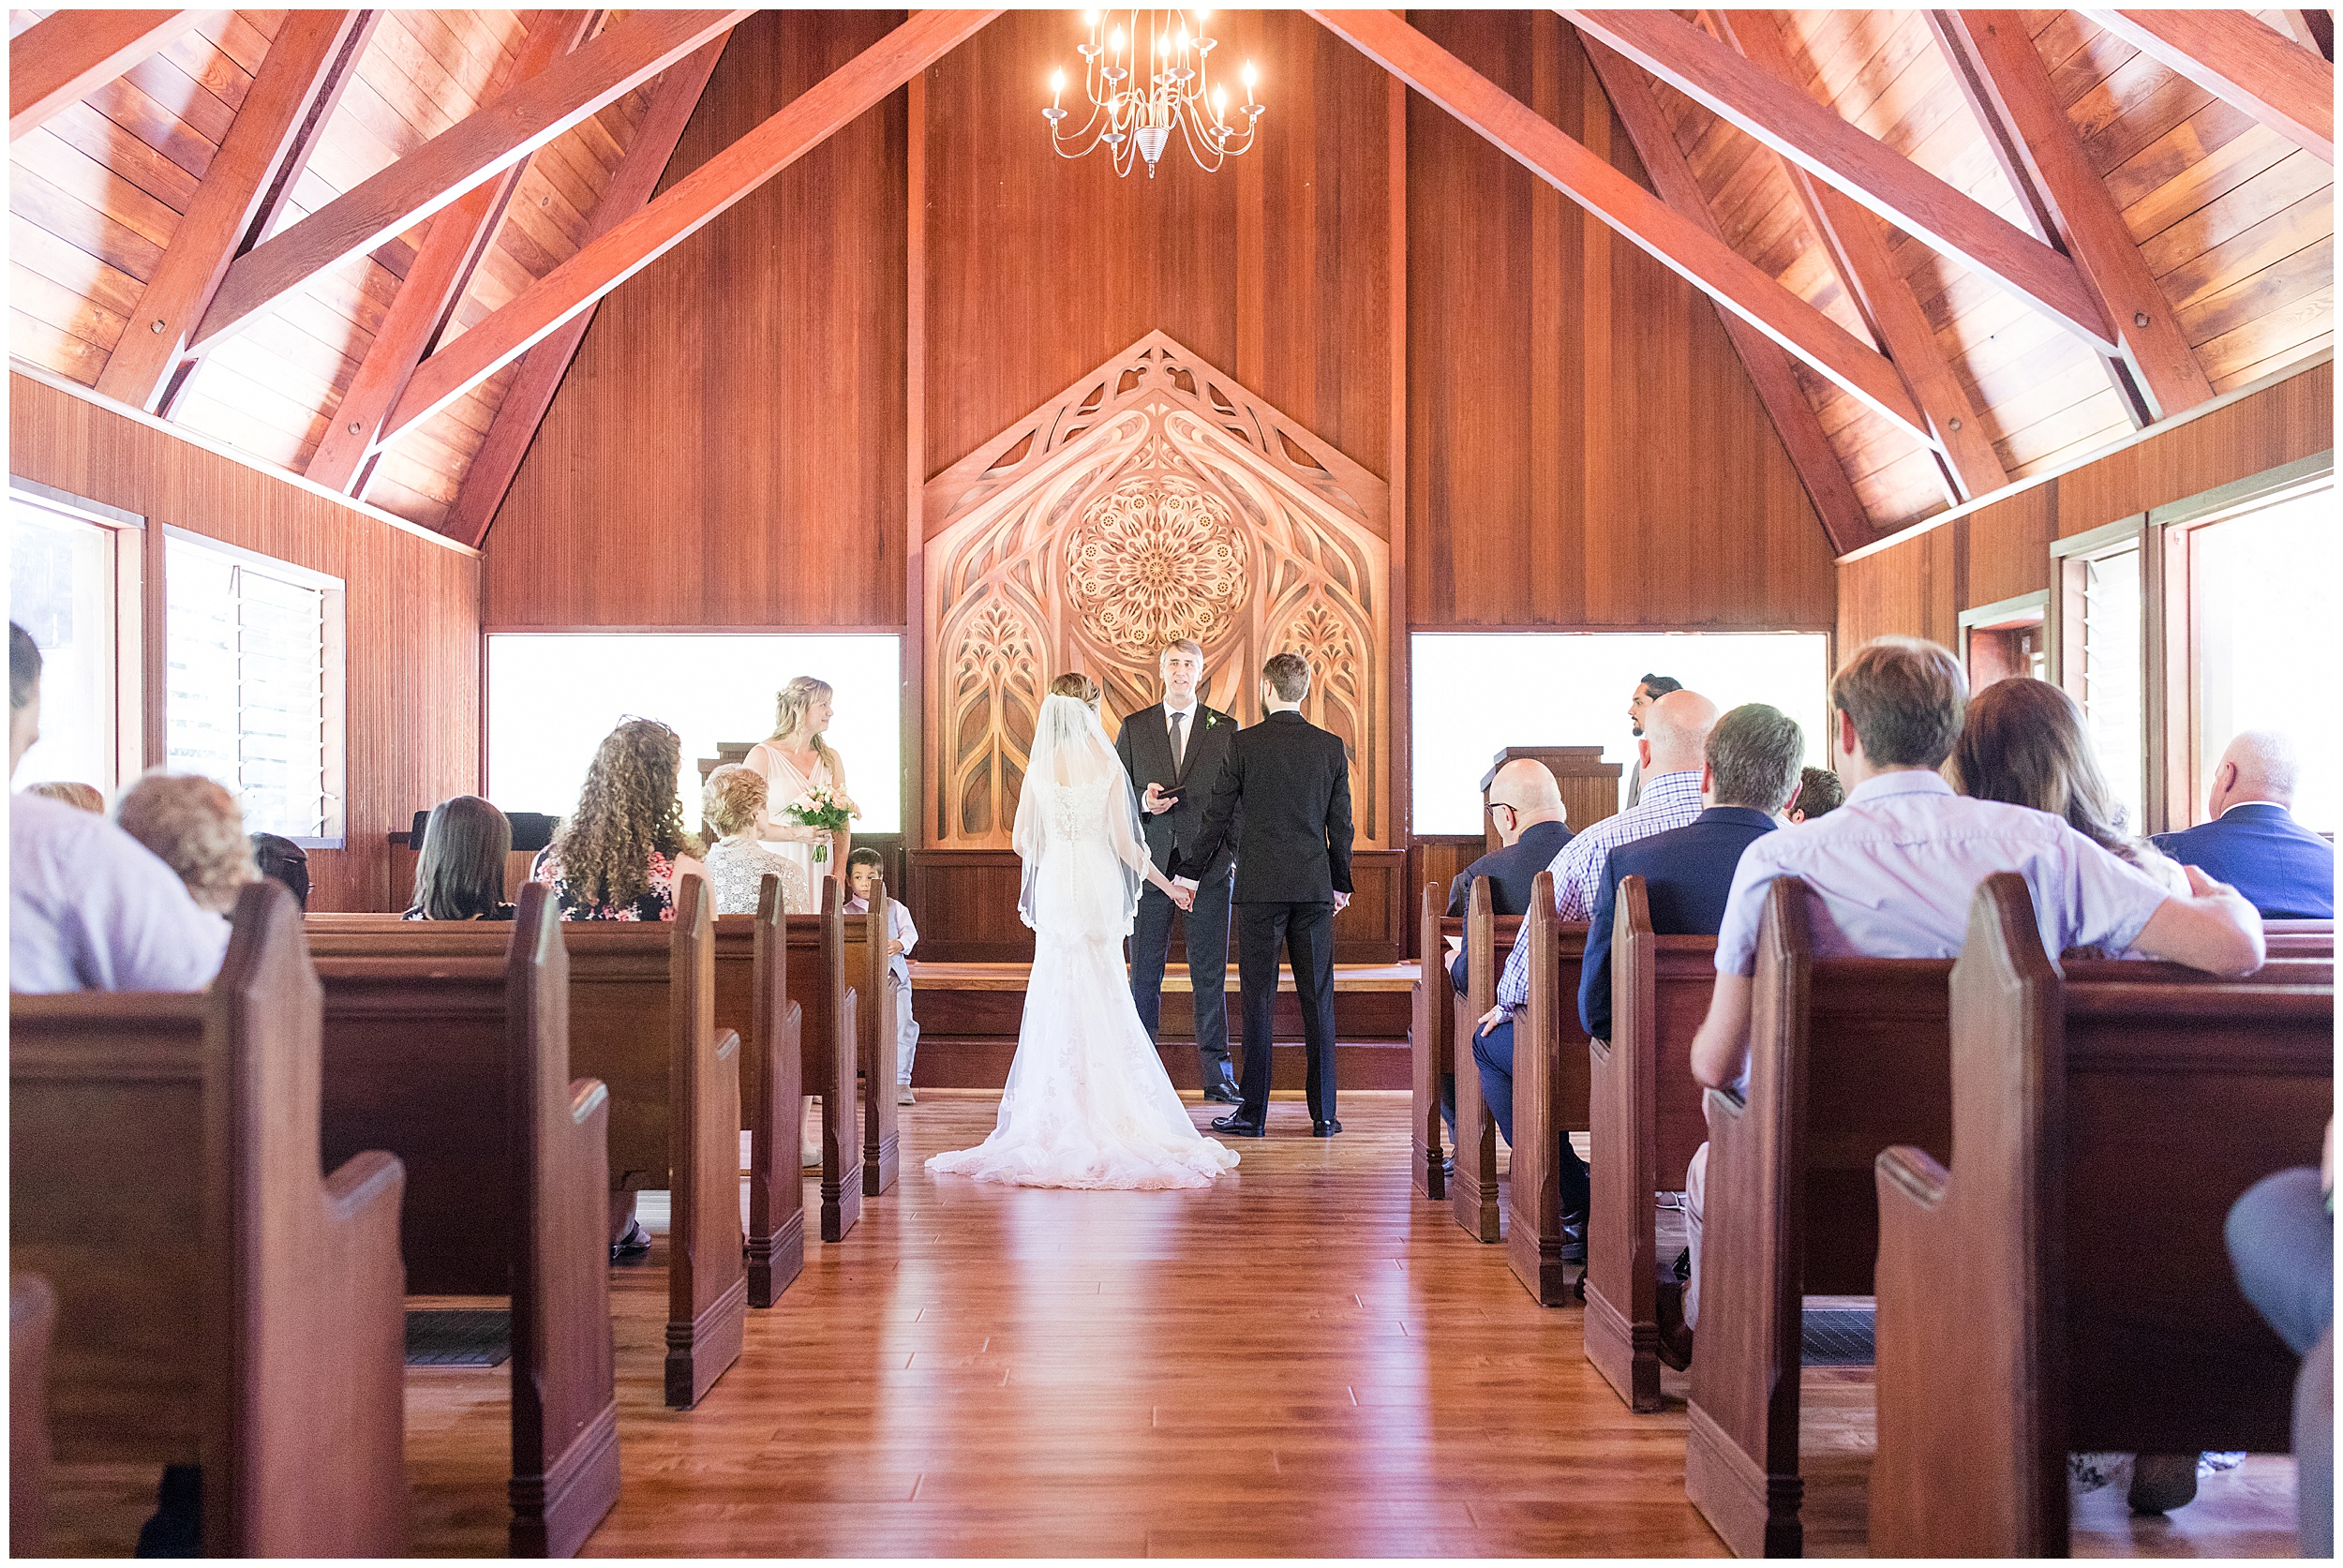 2019 chapel on the hill los gatos san jose bay area wedding photographer angela sue photography_0030.jpg